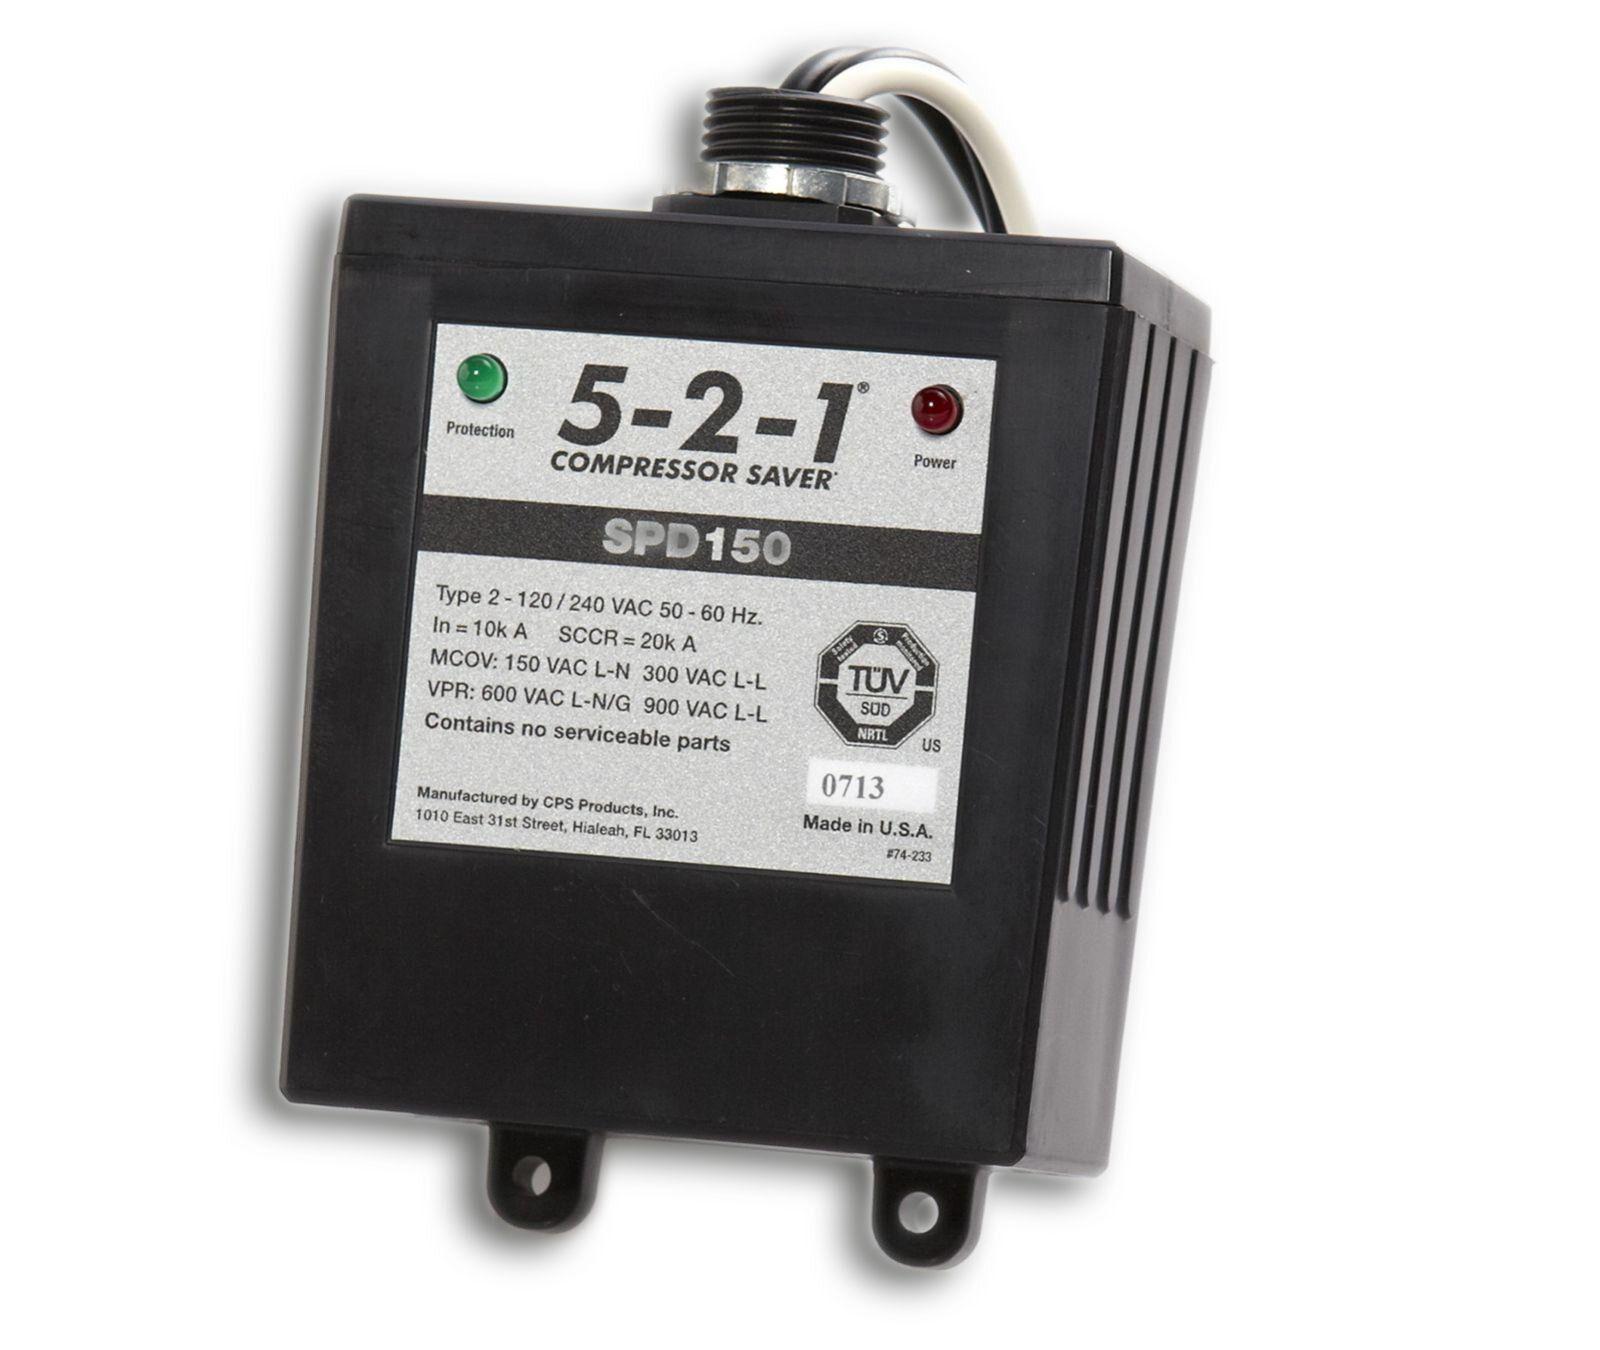 Cps Products Spd150 5 2 1 Compressor Saver 120 240 Volt Single Phase 50 Or 60 Hz 100k Maximum Surge Current Flask